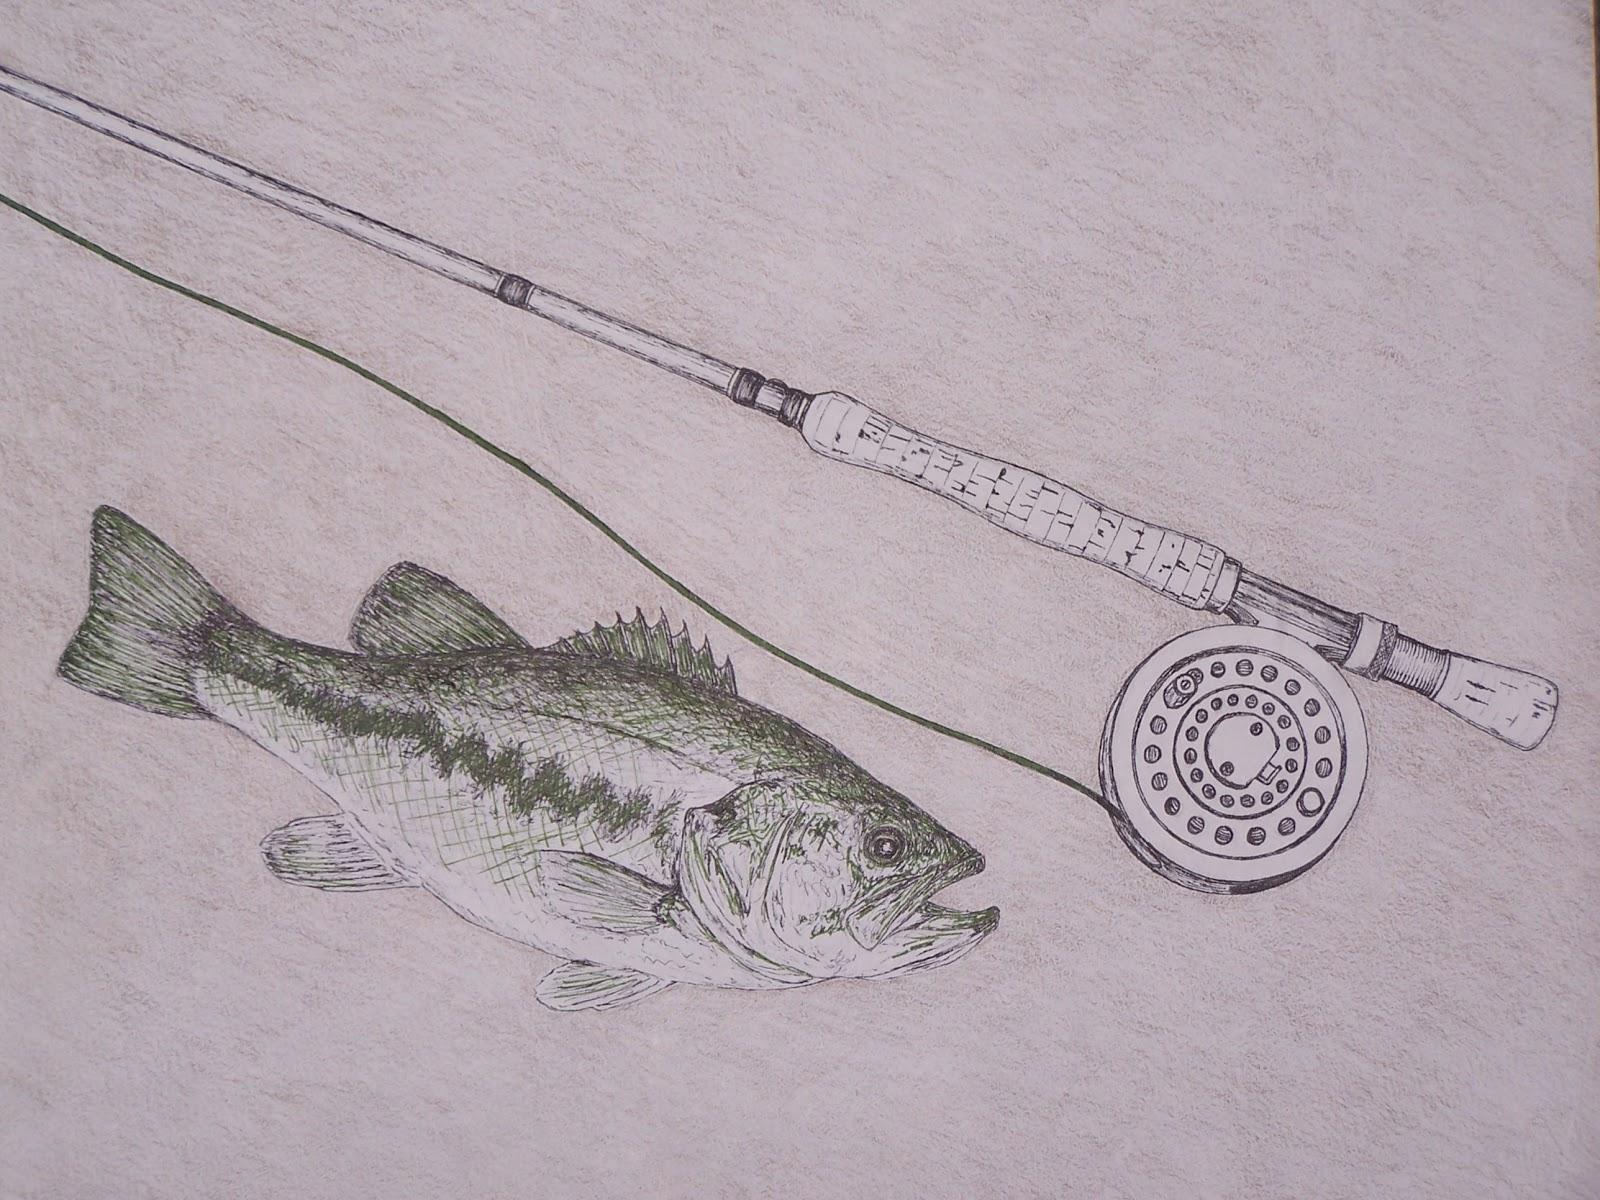 fishing rod sketch - photo #39